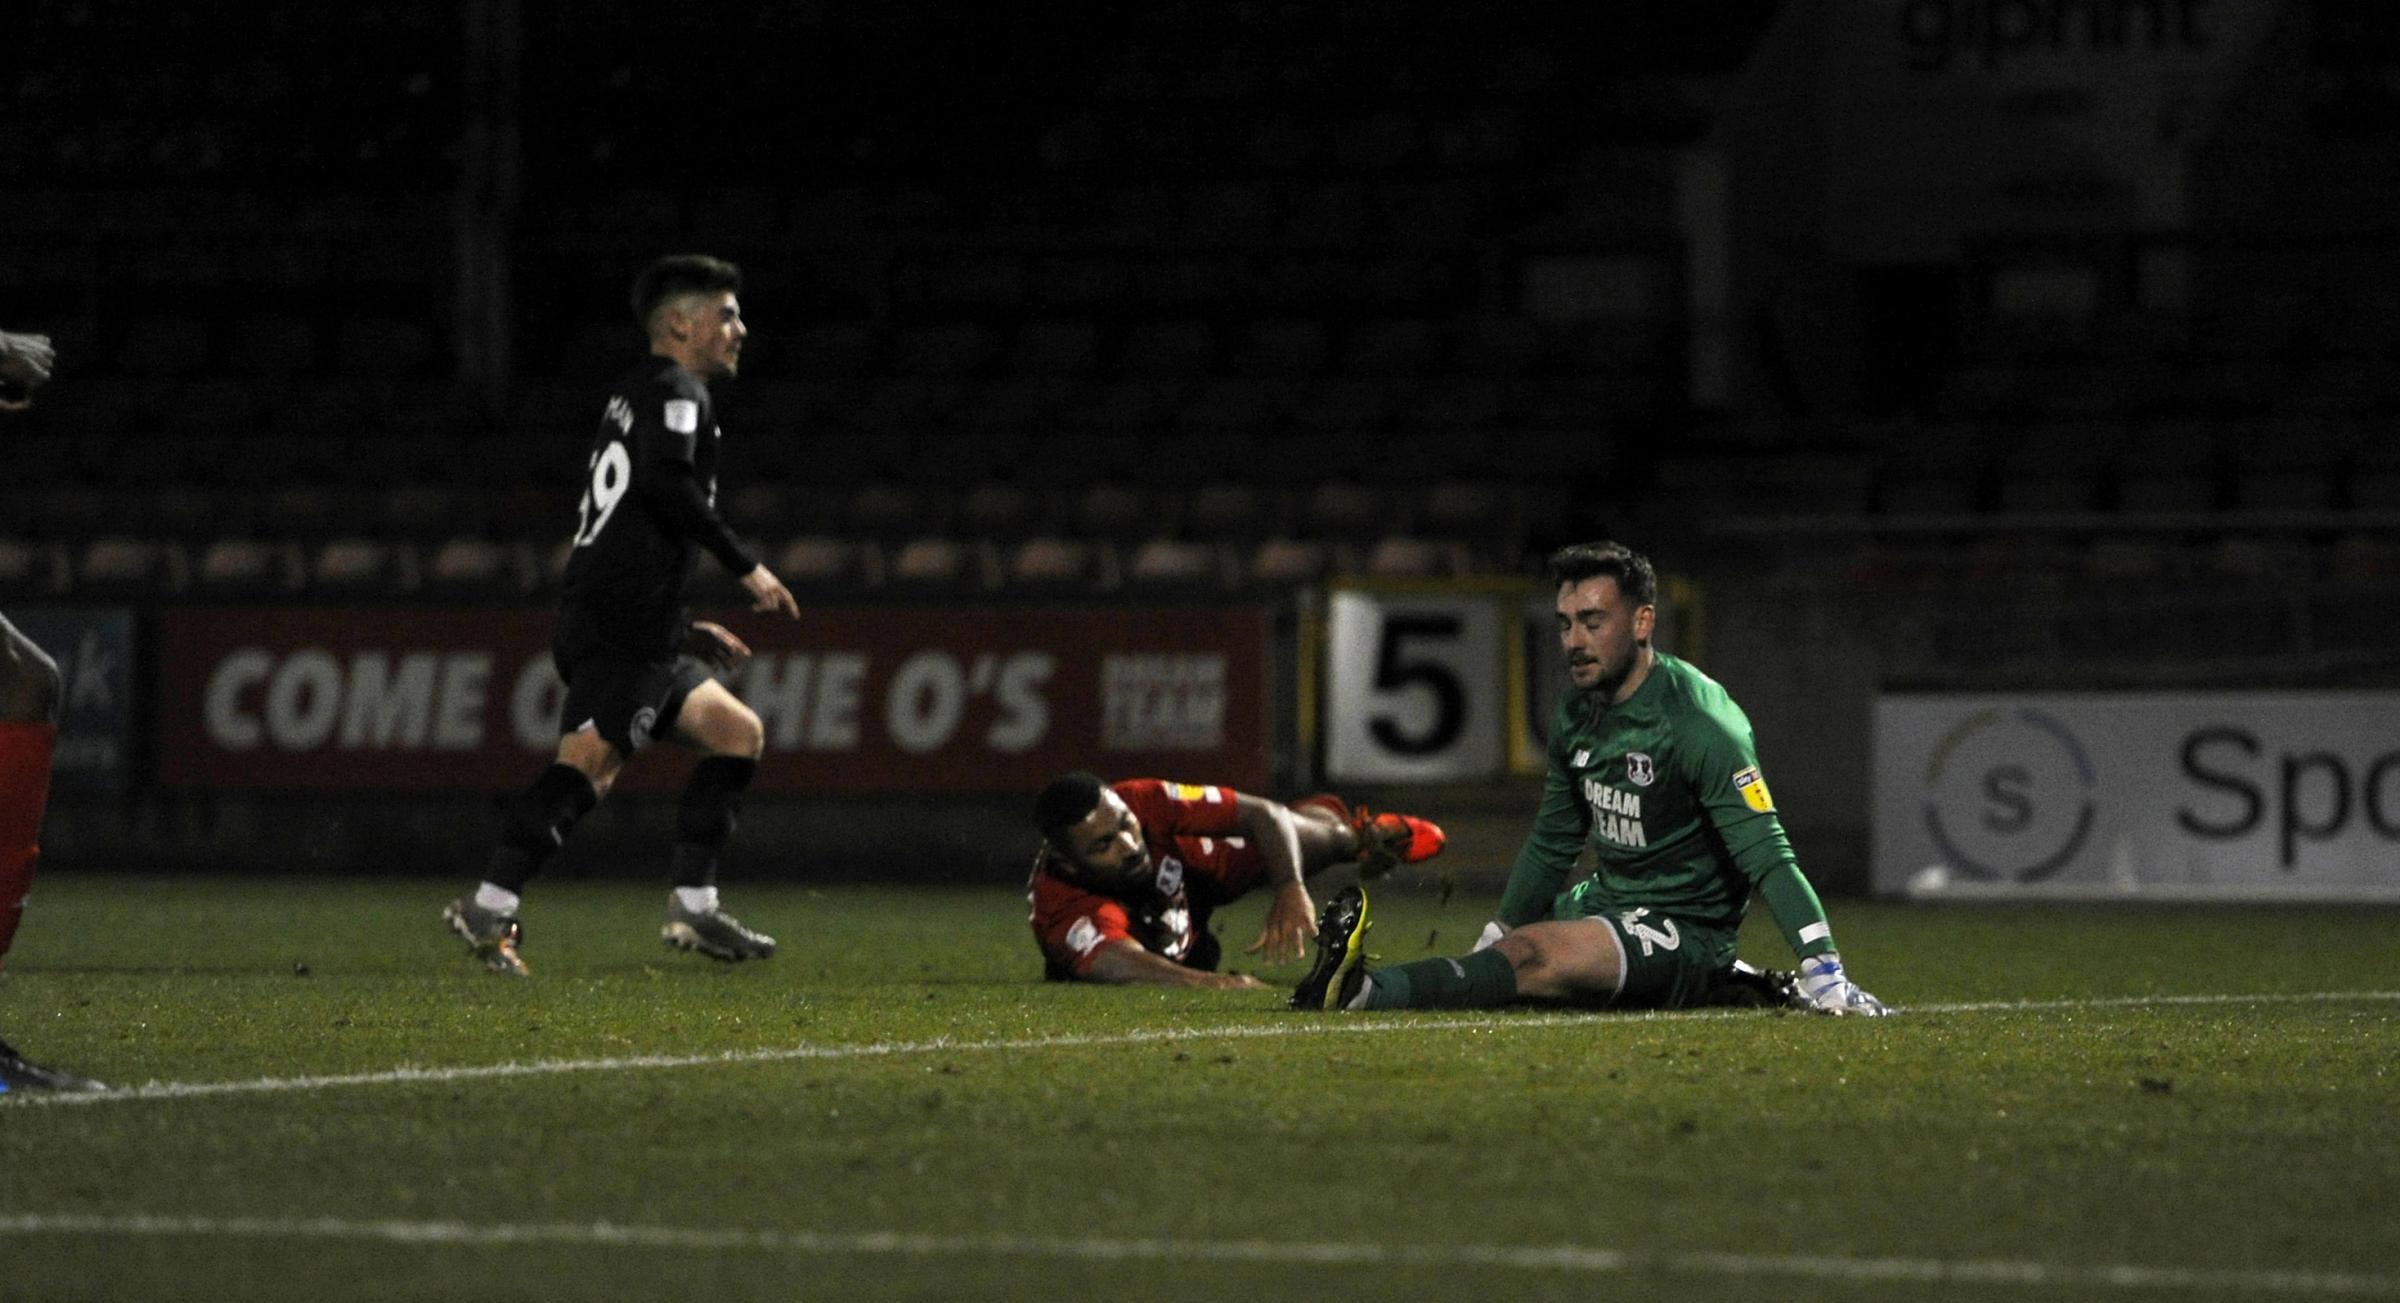 Follow Albion U21's in the Leasing.com trophy against  Leyton Orient: Dennis levels